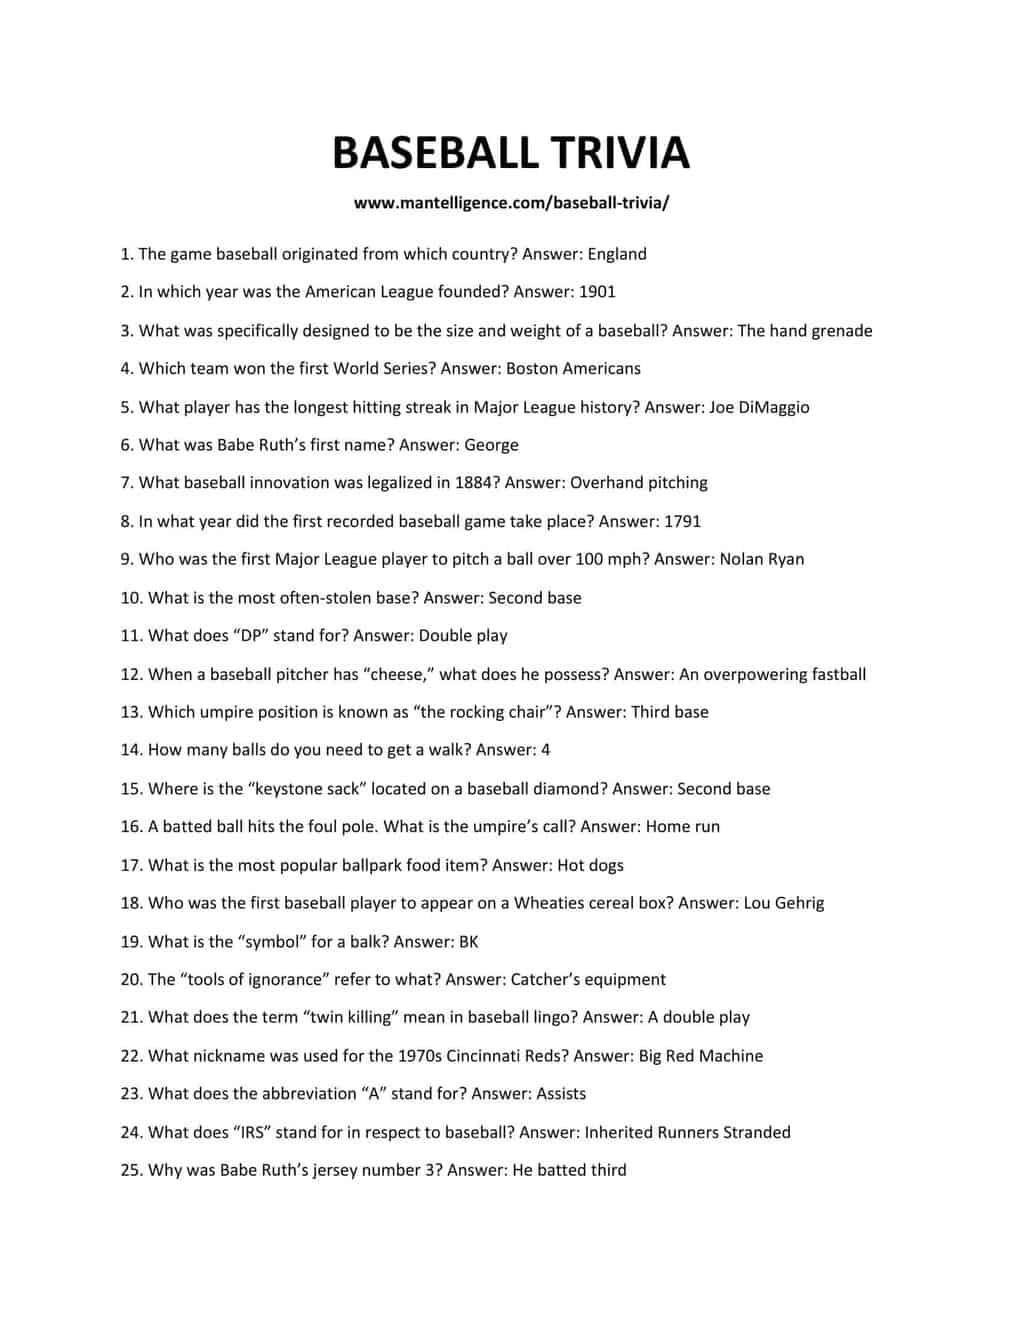 BASEBALL TRIVIA-1